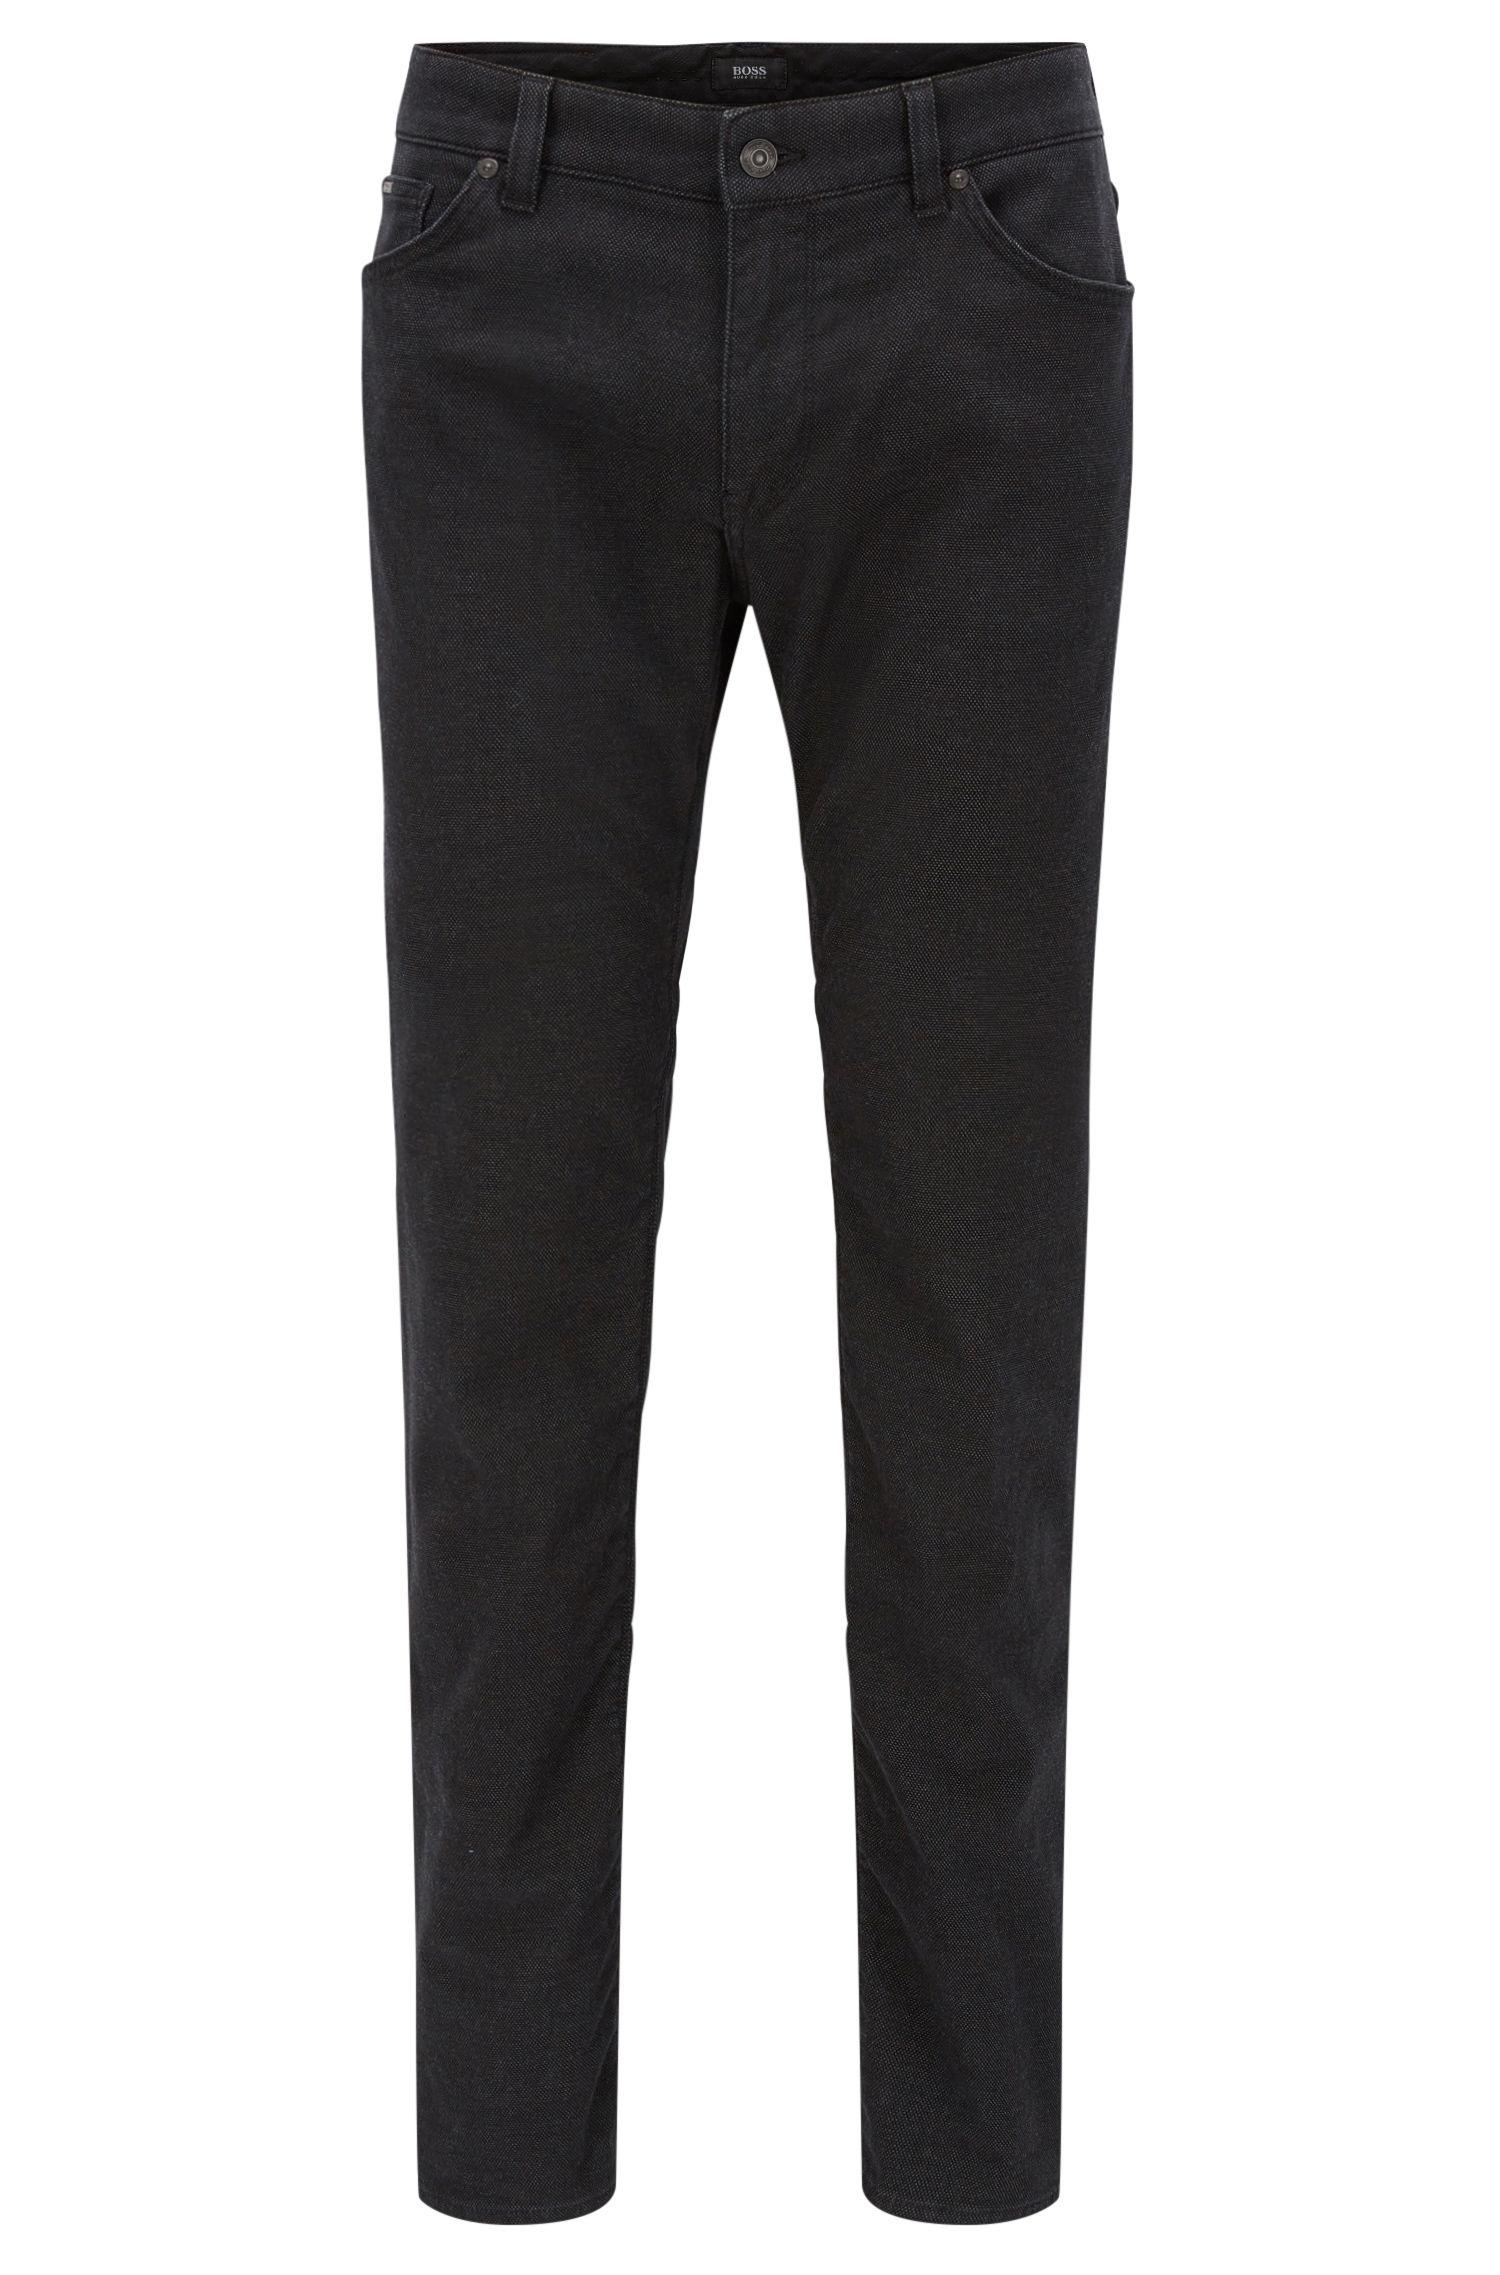 8 oz Stretch Cotton Jeans, Regular Fit | Maine